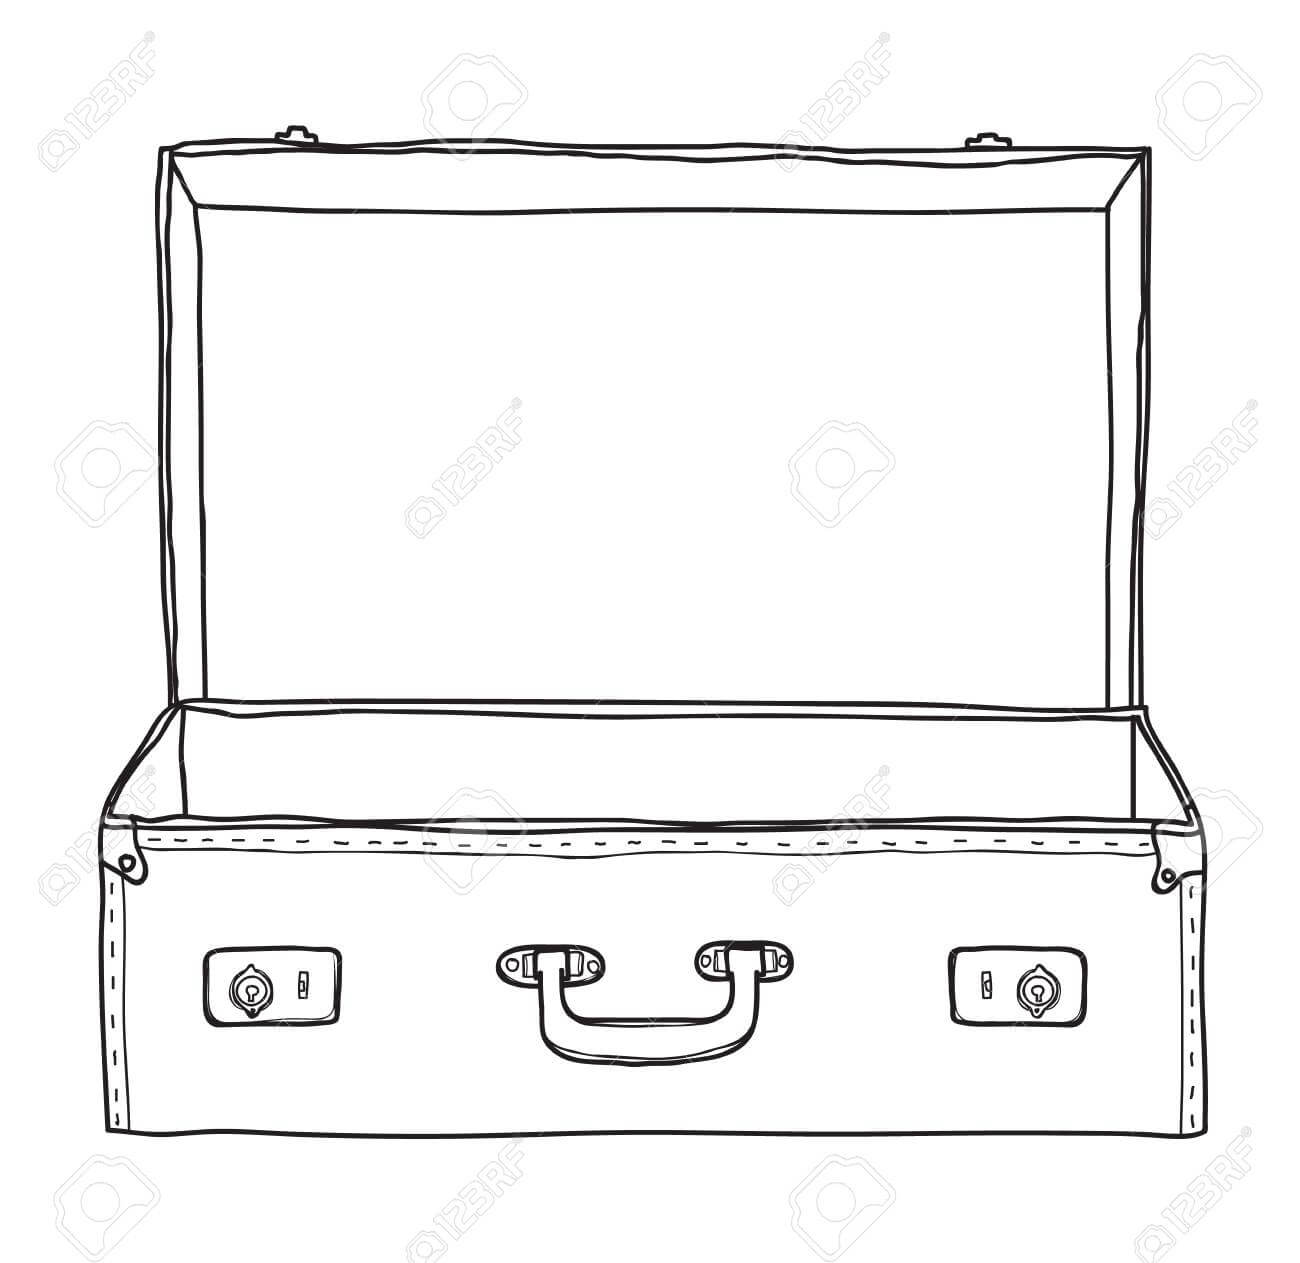 Suitcase Vintage Empty Suitcase Hand Drawn Vector Line Art Illustration inside Blank Suitcase Template